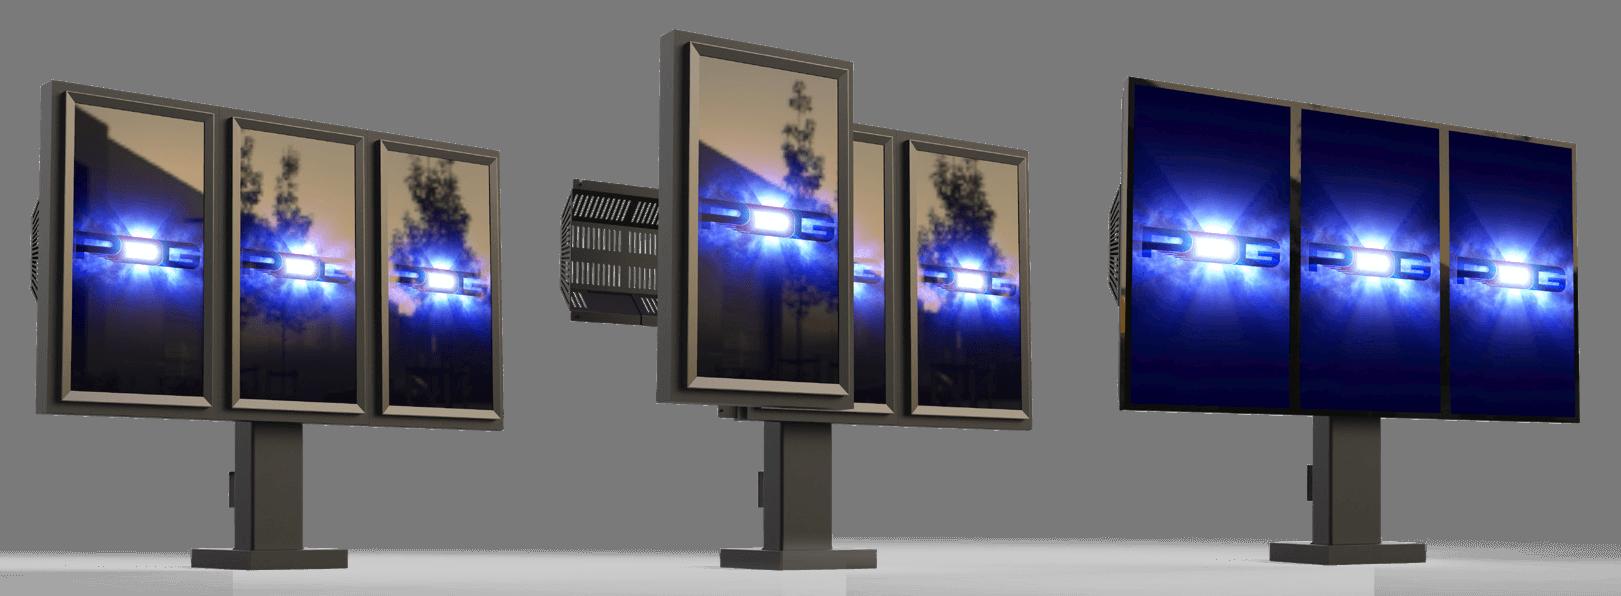 drivethru digital menu boards